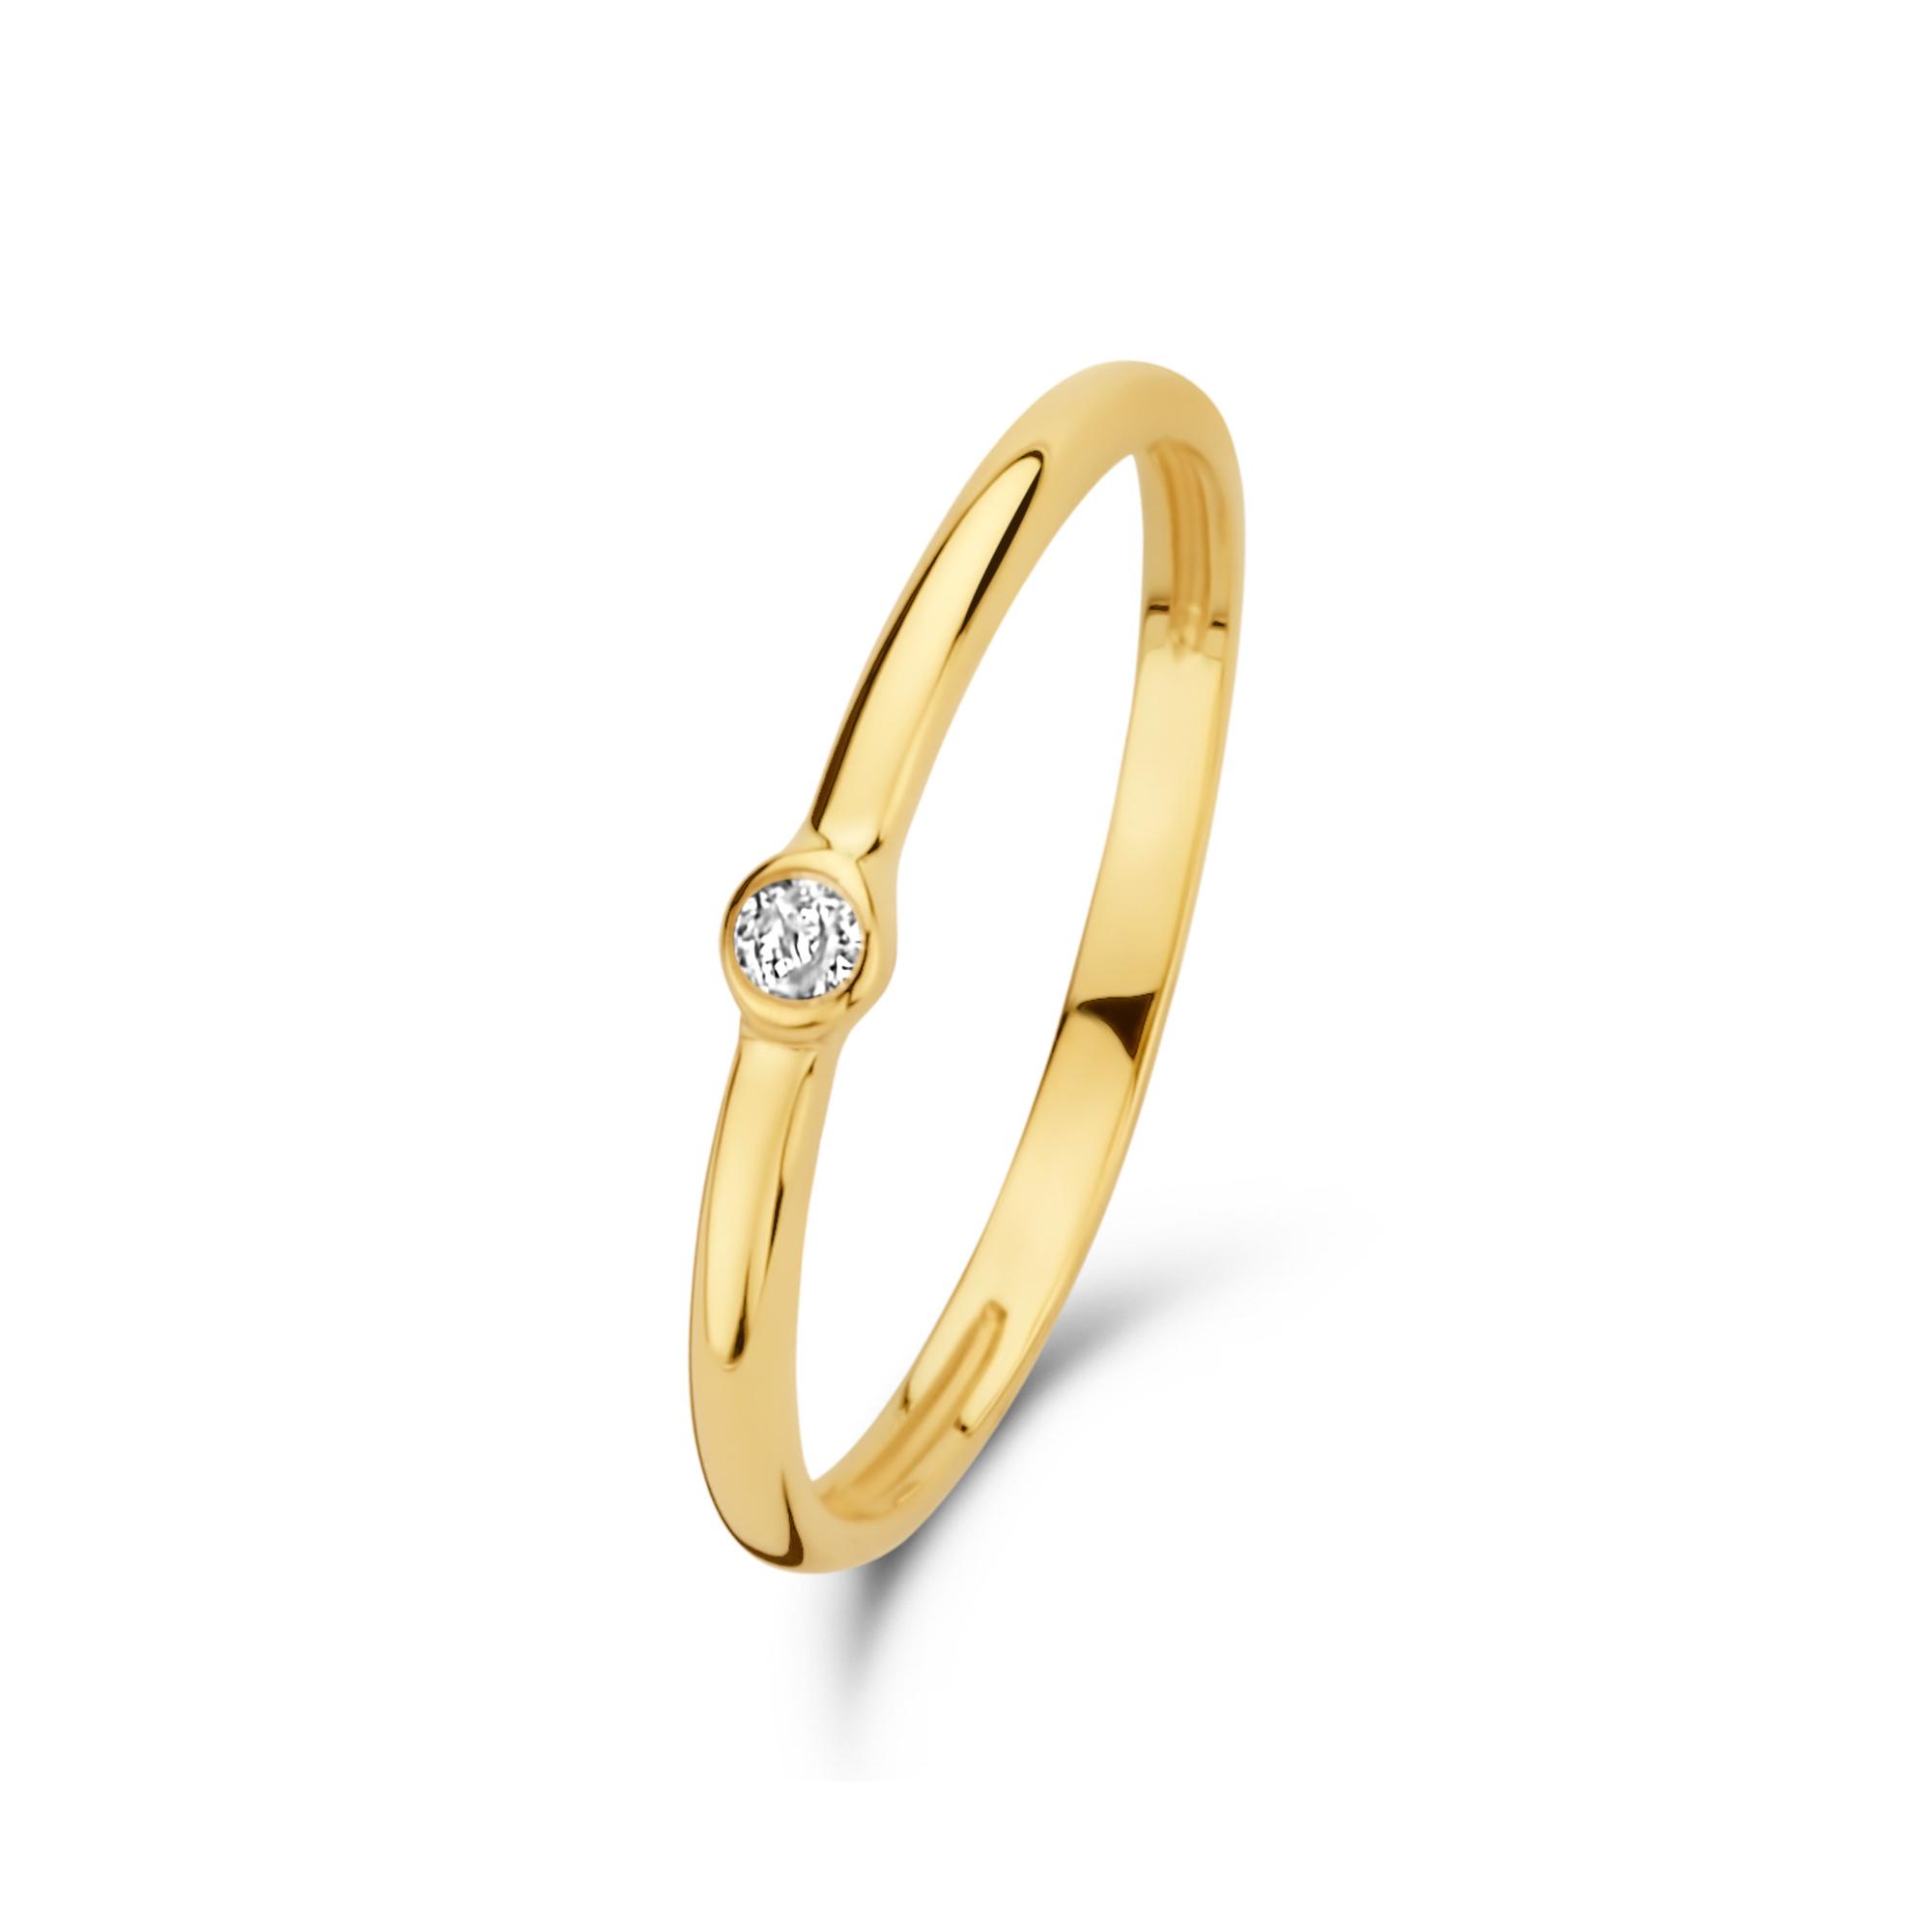 Isabel Bernard Asterope Solitary 14 karaat gouden stacking ring met zirkonia